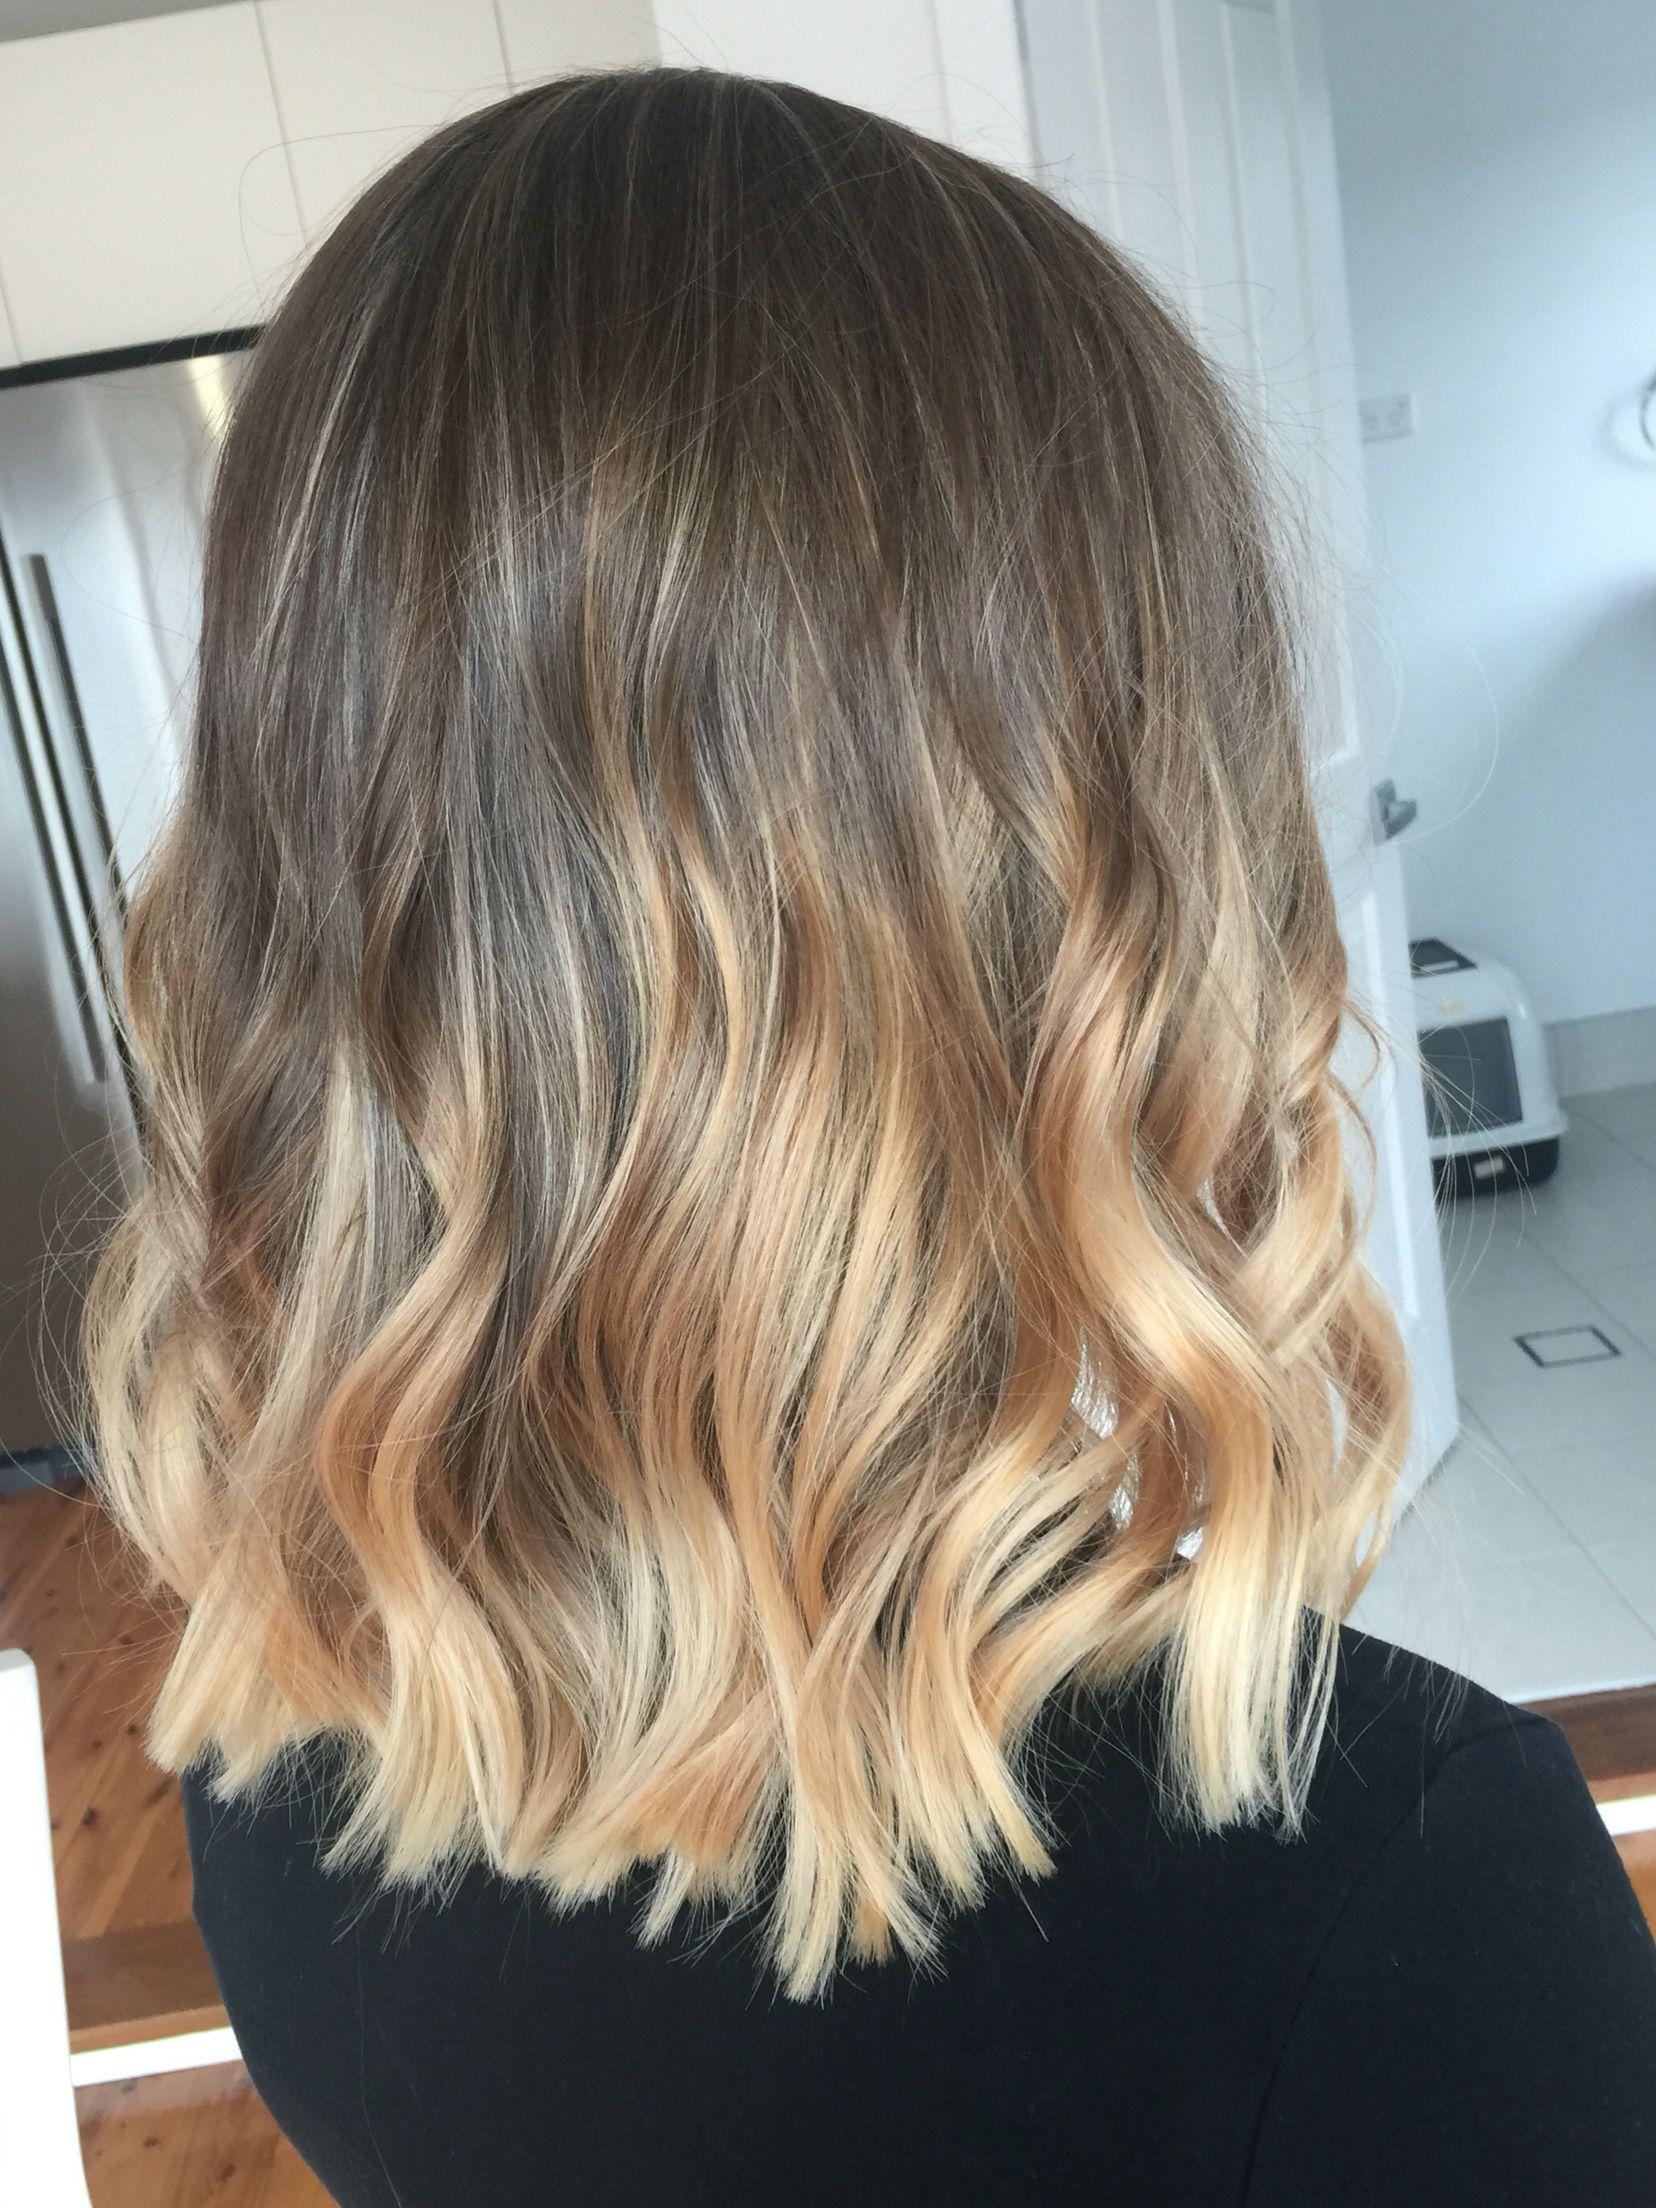 Lived In Hair Colour Blonde Brunette Golden Tones Balayage Face